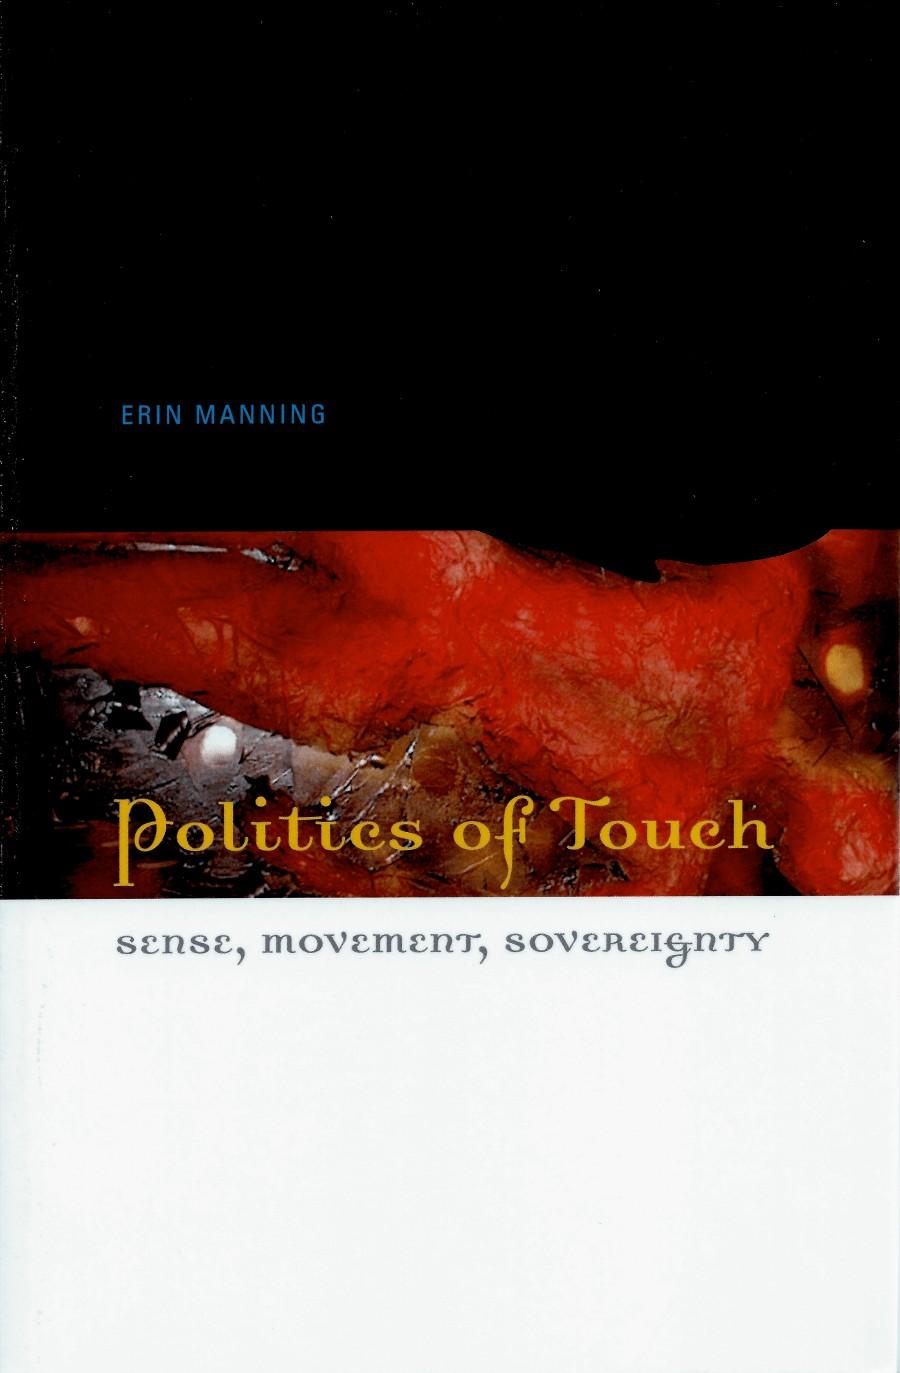 Politics of Touch - Sense